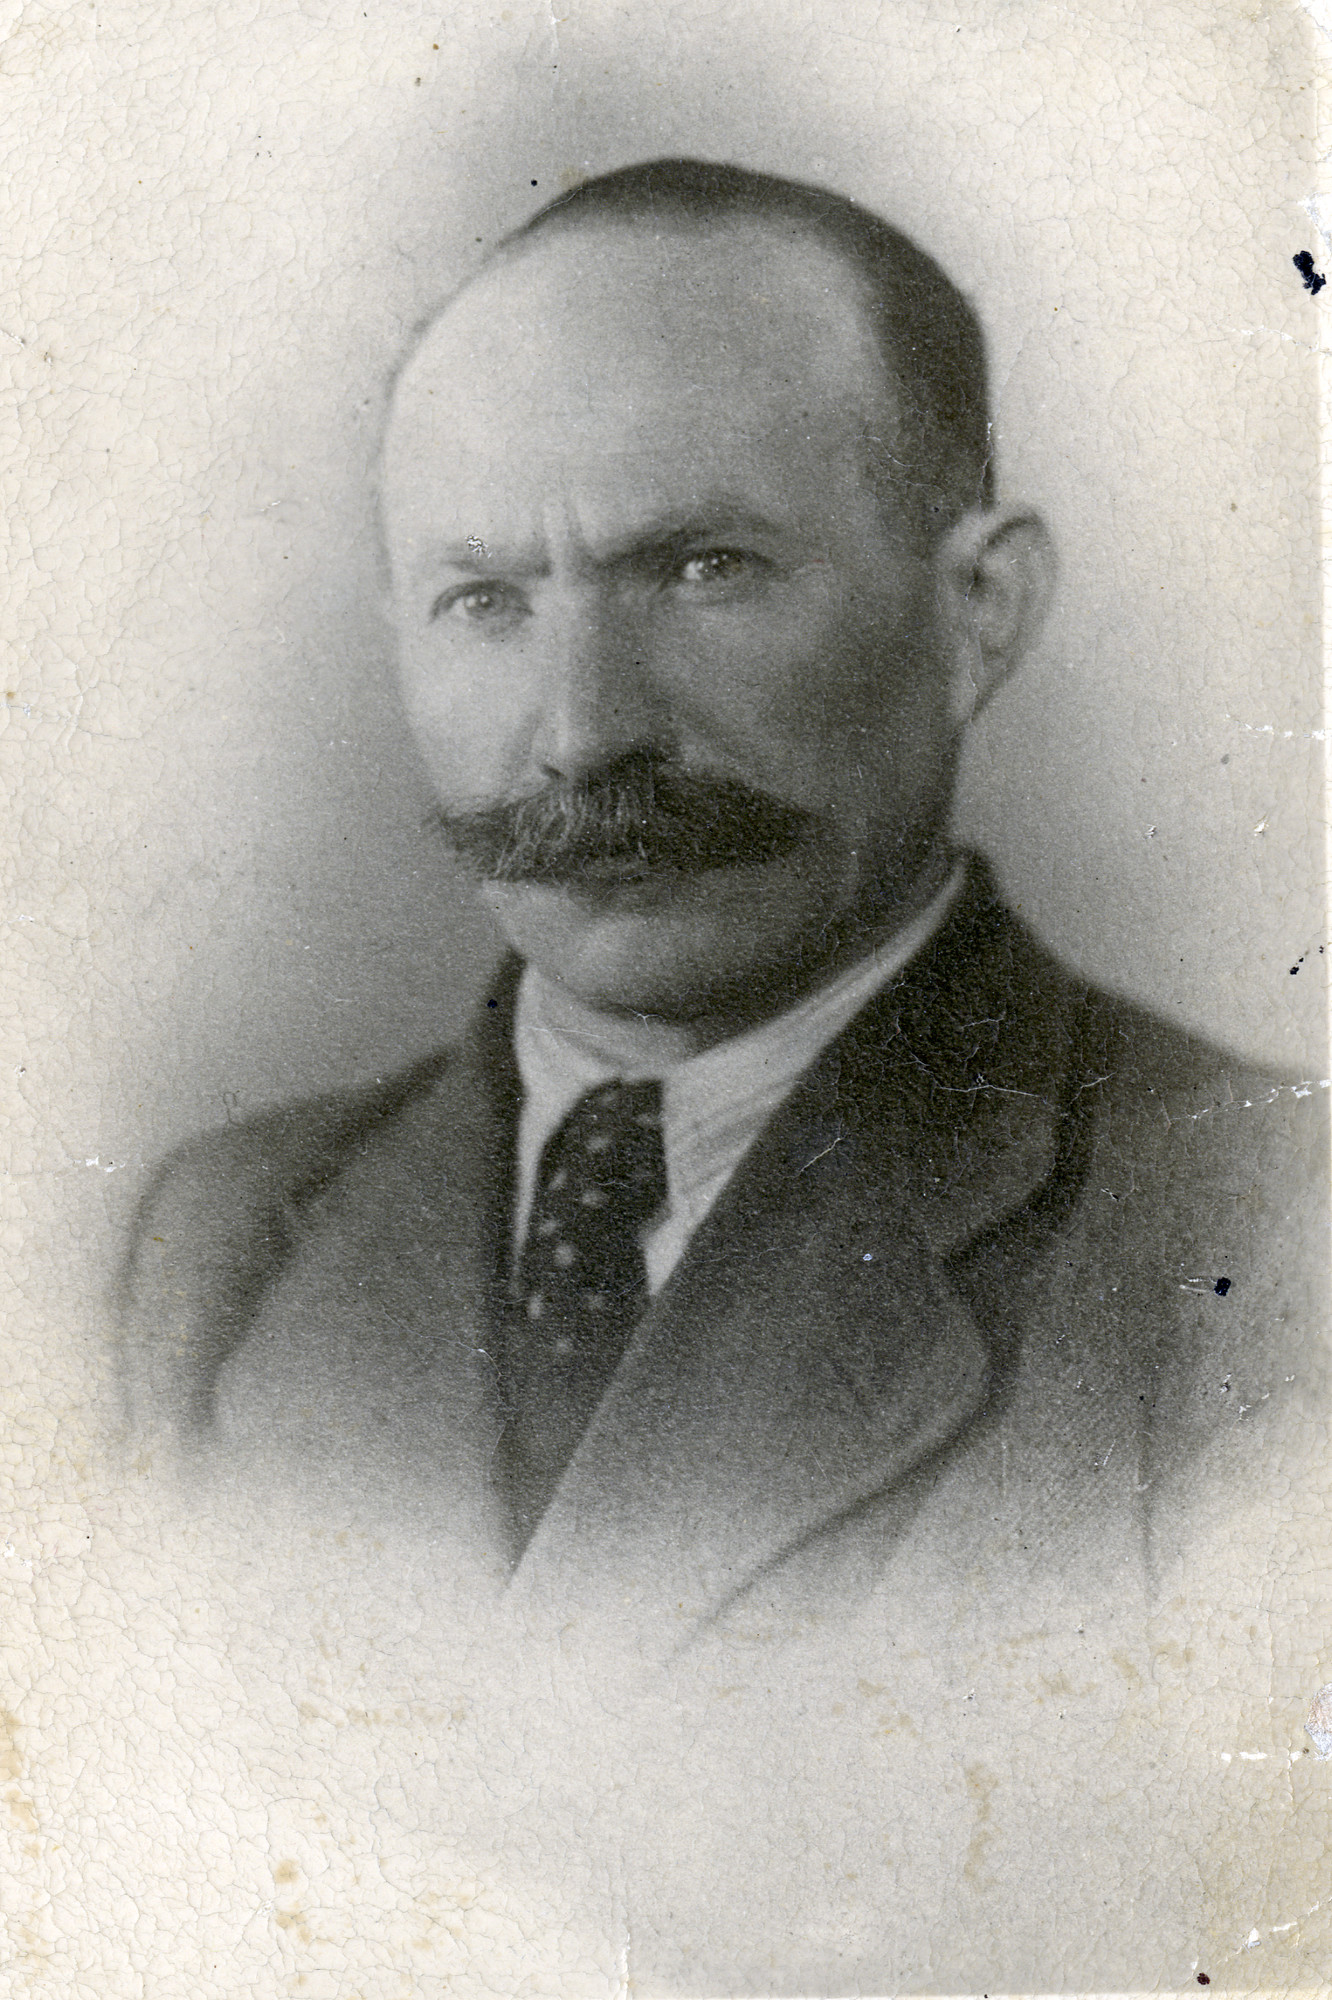 Studio portrait of Israel Miedzyrzecki while posing as a Christian named Stephan.